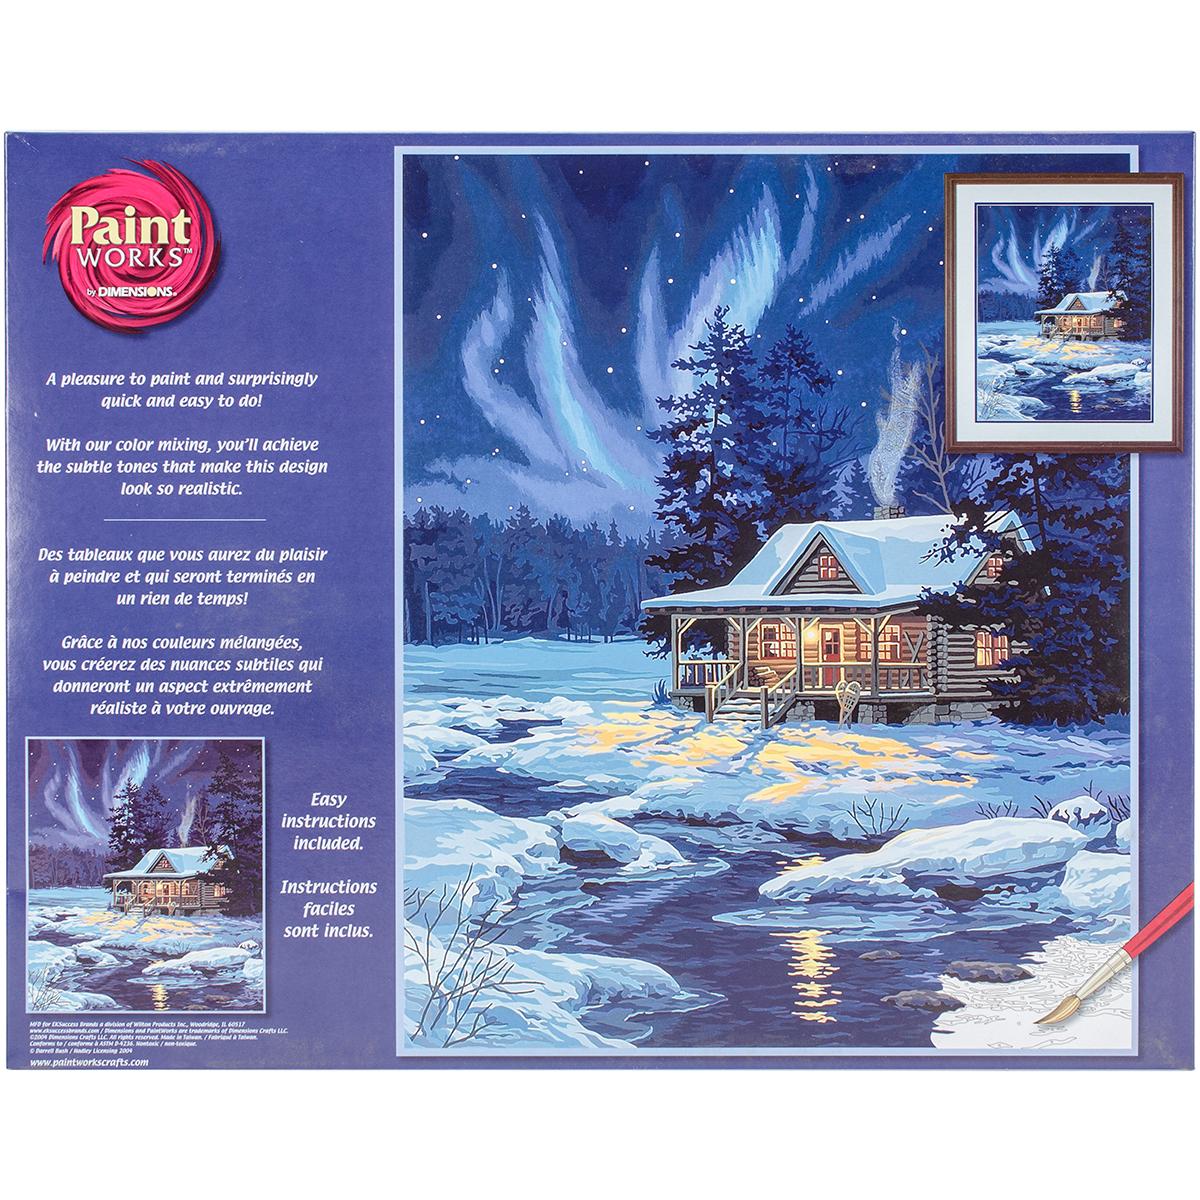 Paint Works Paint By Number Kit 16X20-Moonlit Cabin